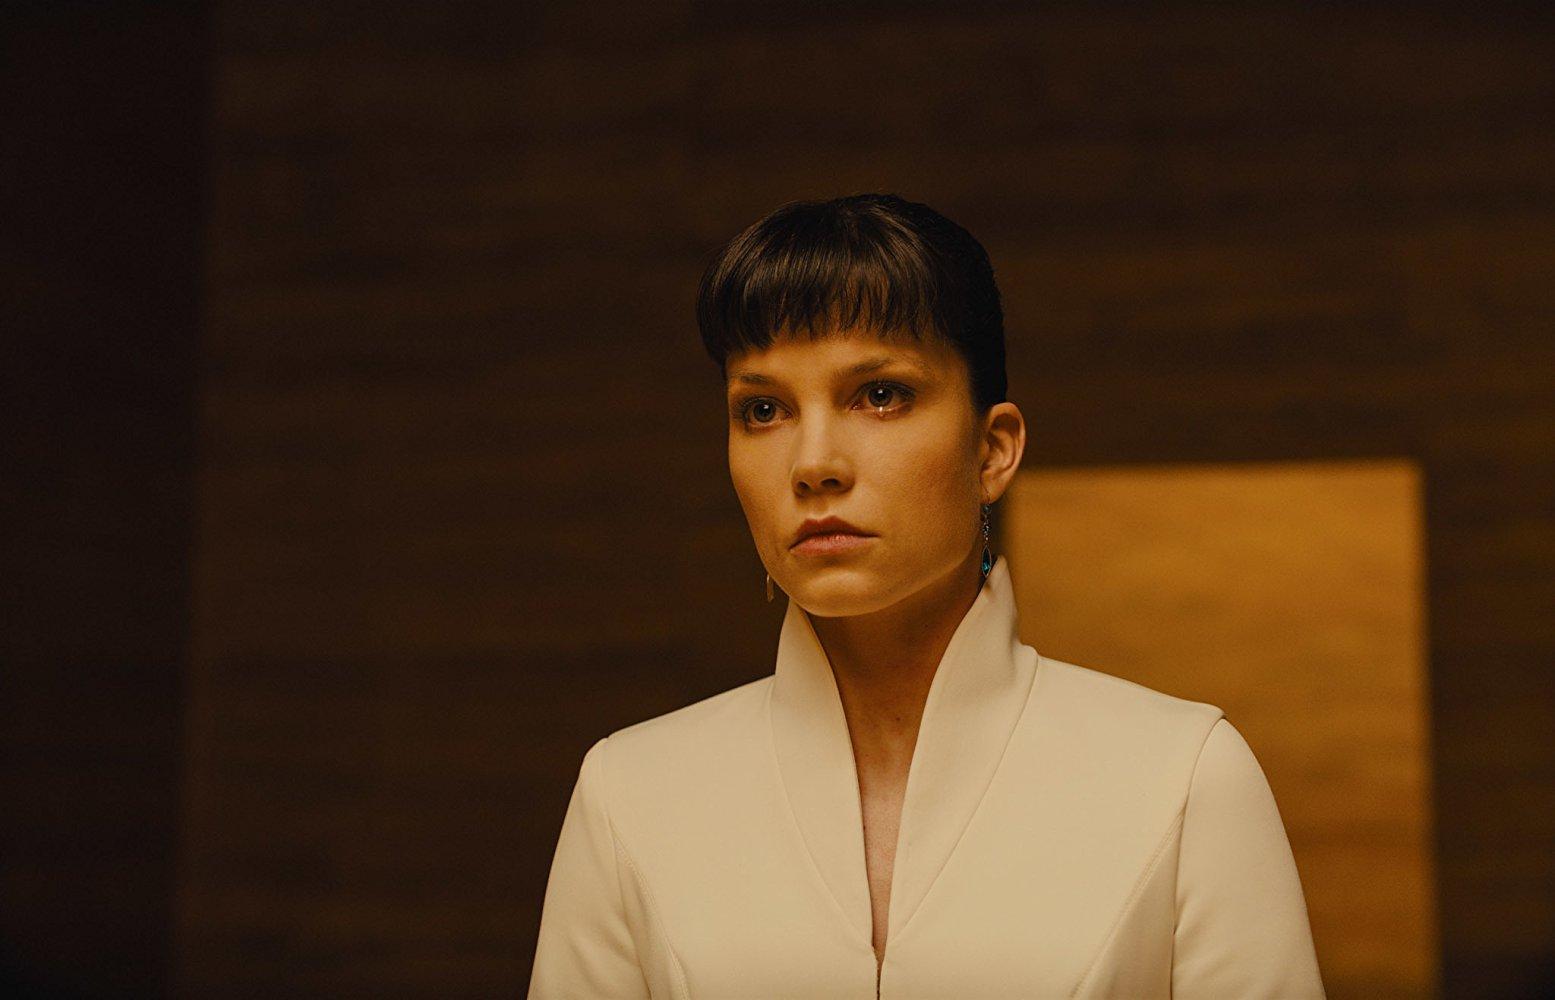 Бегущий по лезвию 2049, Бегущий по лезвию, Blade Runner 2049, Blade Runner, продолжение, Дени Вильнёв, фантастика, драма, киберпанк, SciFi, Drama, Cyberpunk, обзор, рецензия, без спойлеров, Review